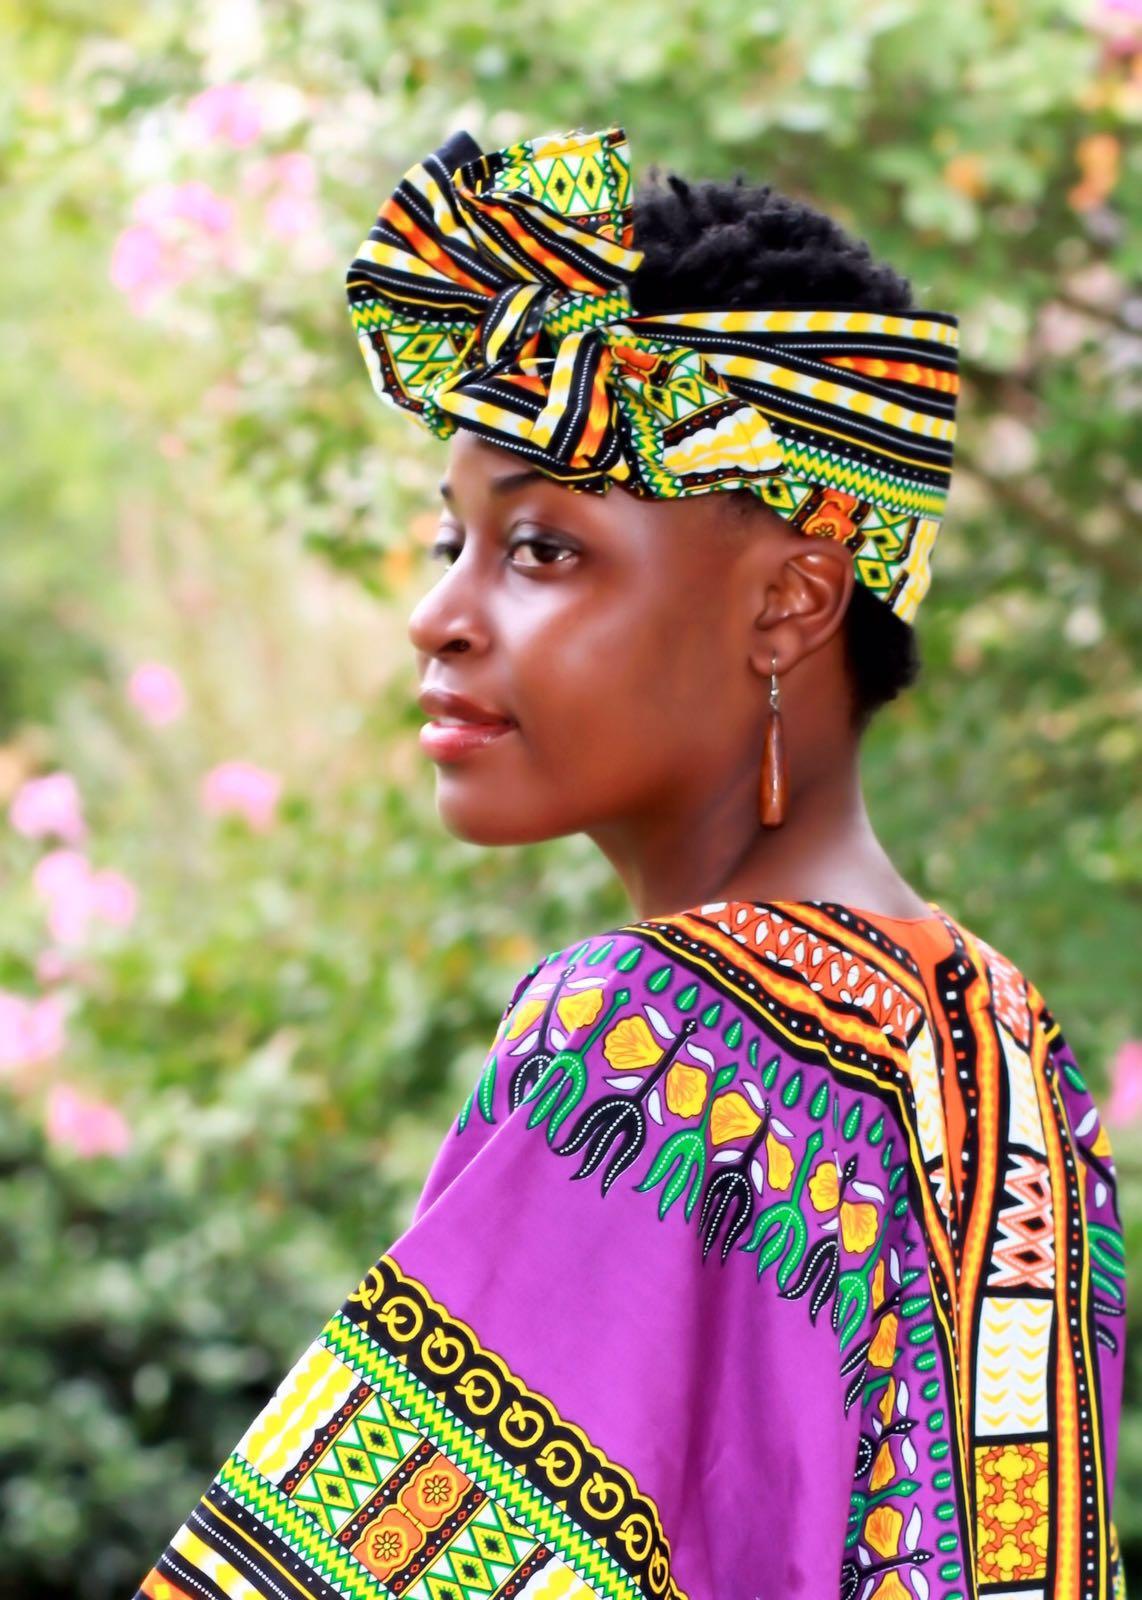 Sipho Mnikwa has been keeping her hair natural since 2014. (Photo: Sipho Mnikwa)